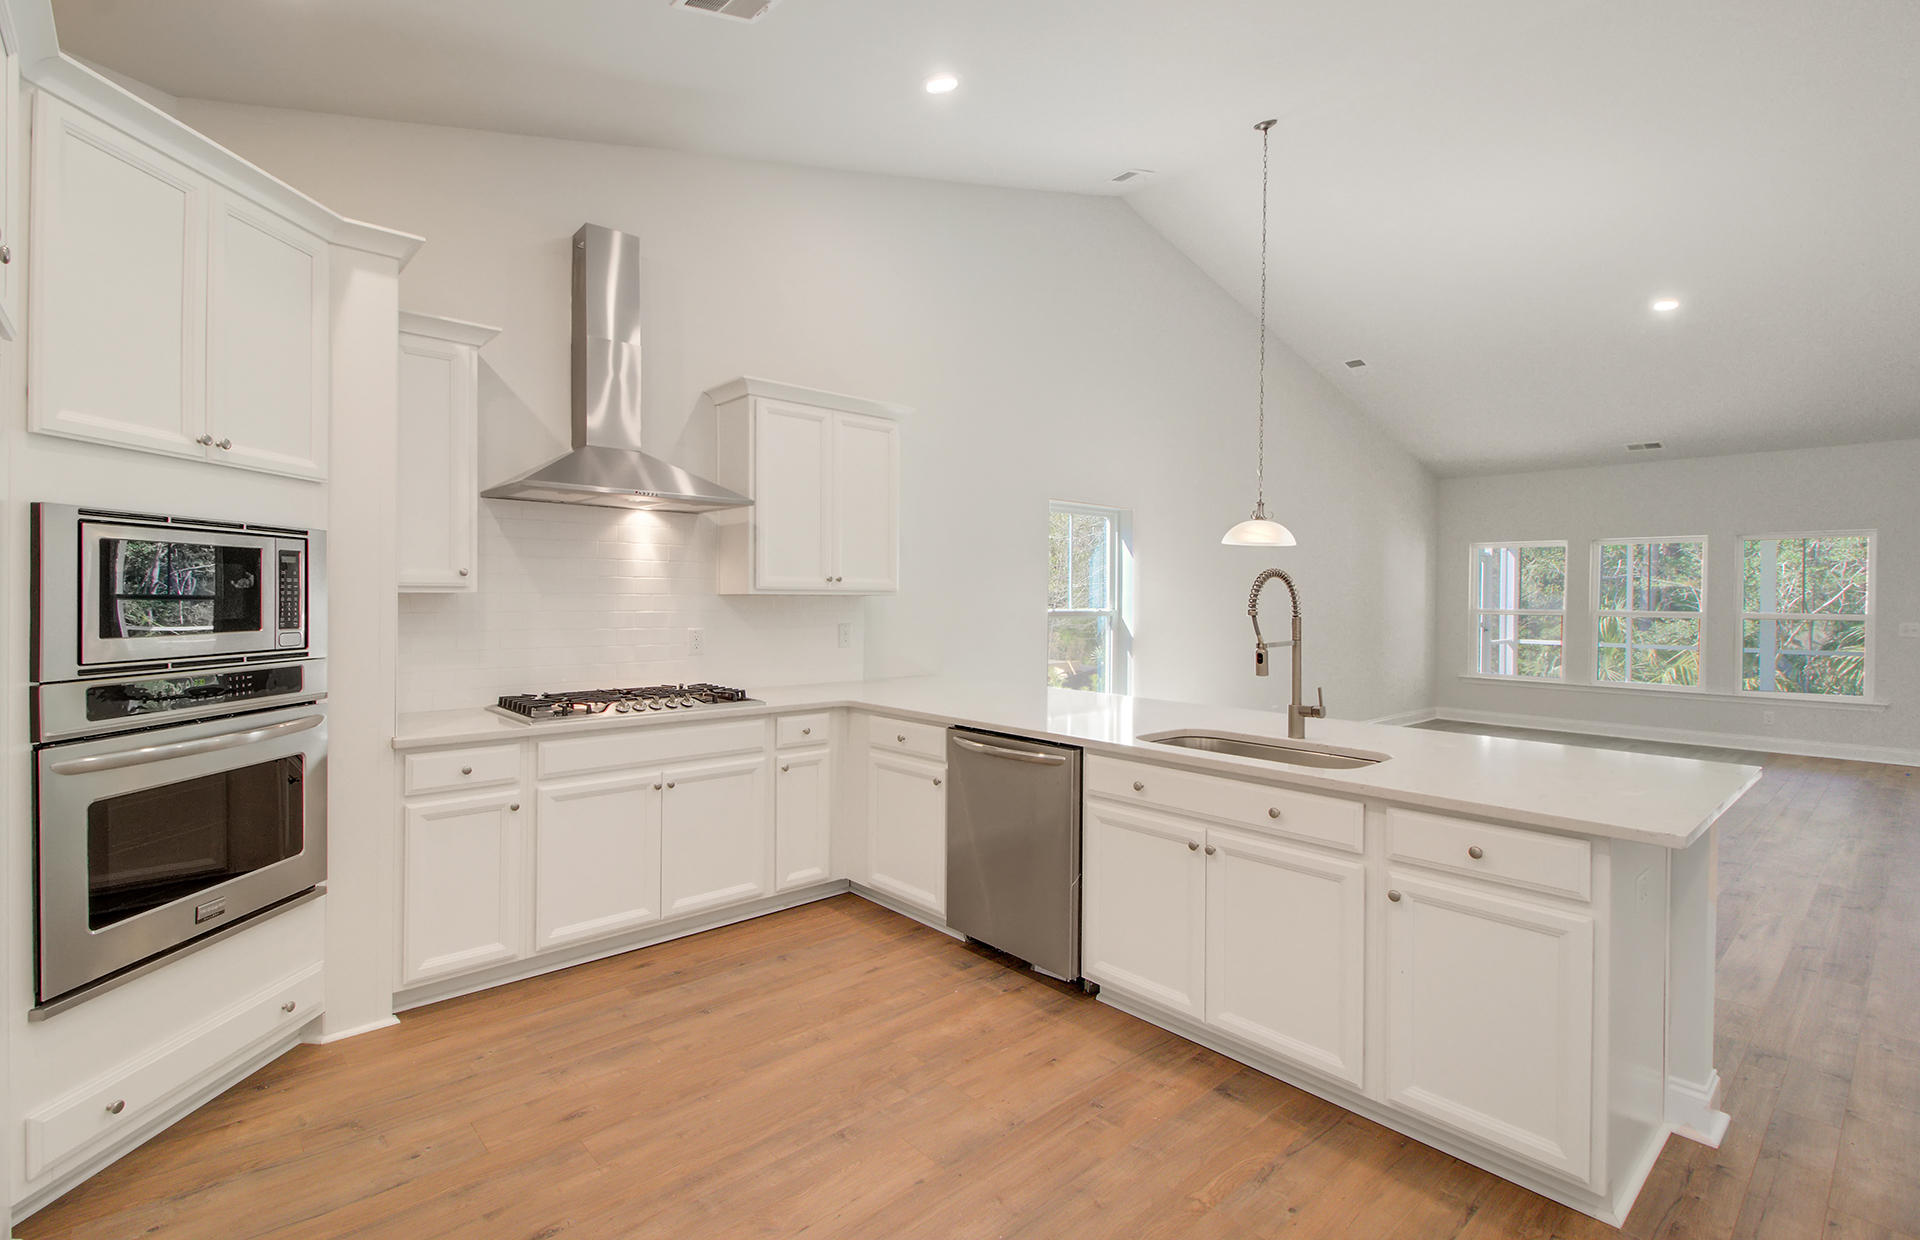 Park West Homes For Sale - 3062 Rice Field, Mount Pleasant, SC - 8